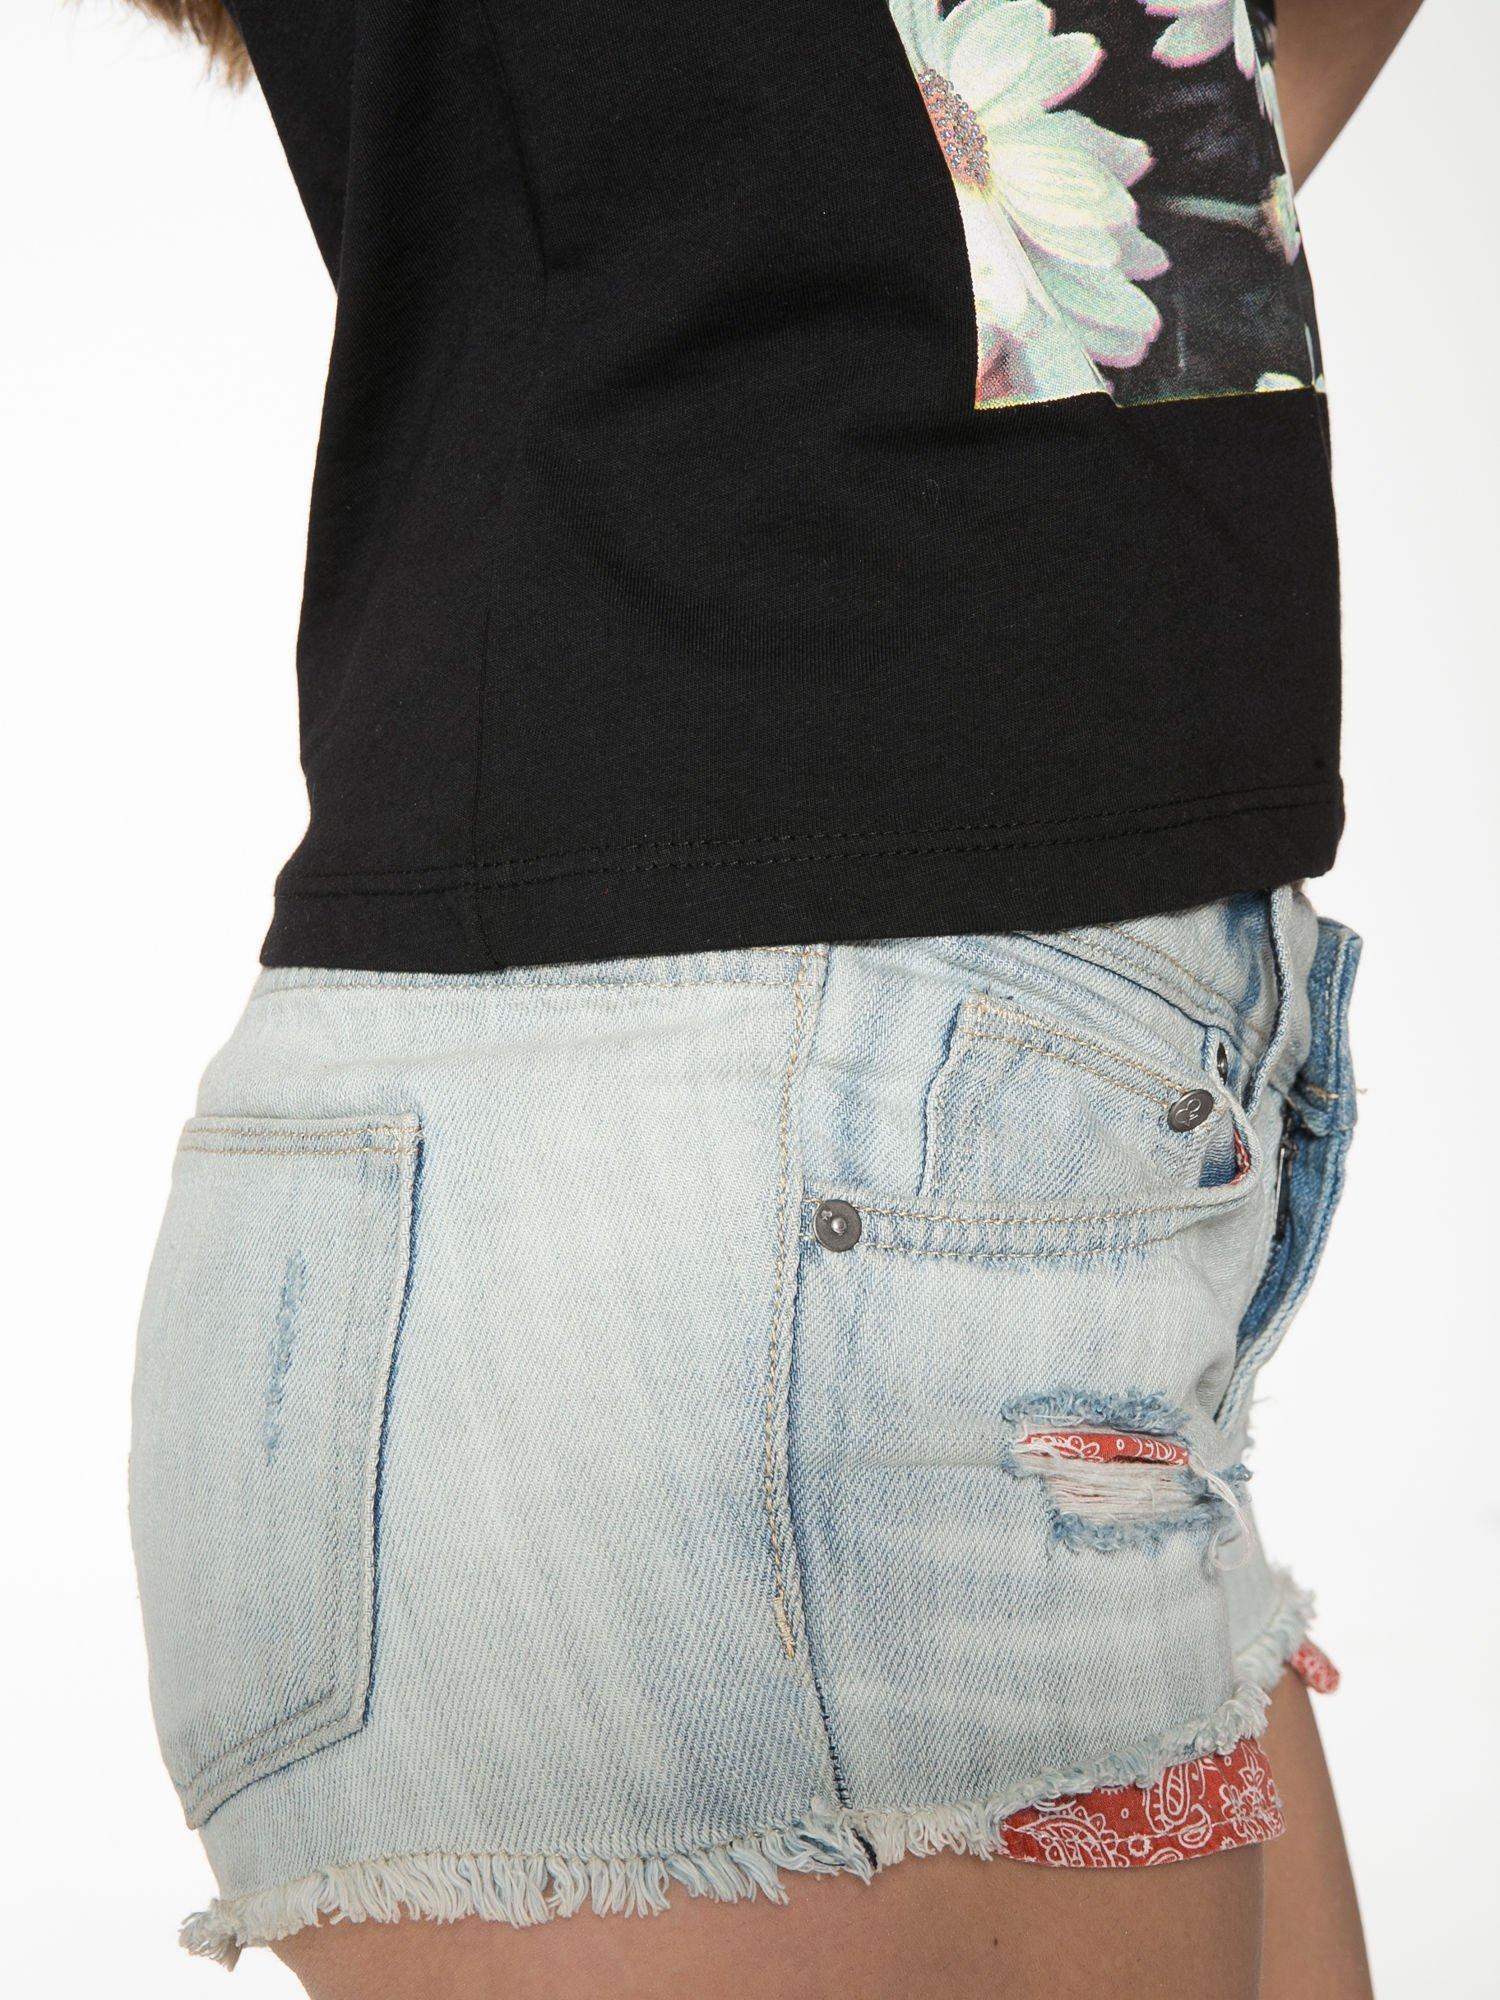 Czarny krótki t-shirt z nadrukiem stokrotek i napisem                                  zdj.                                  9